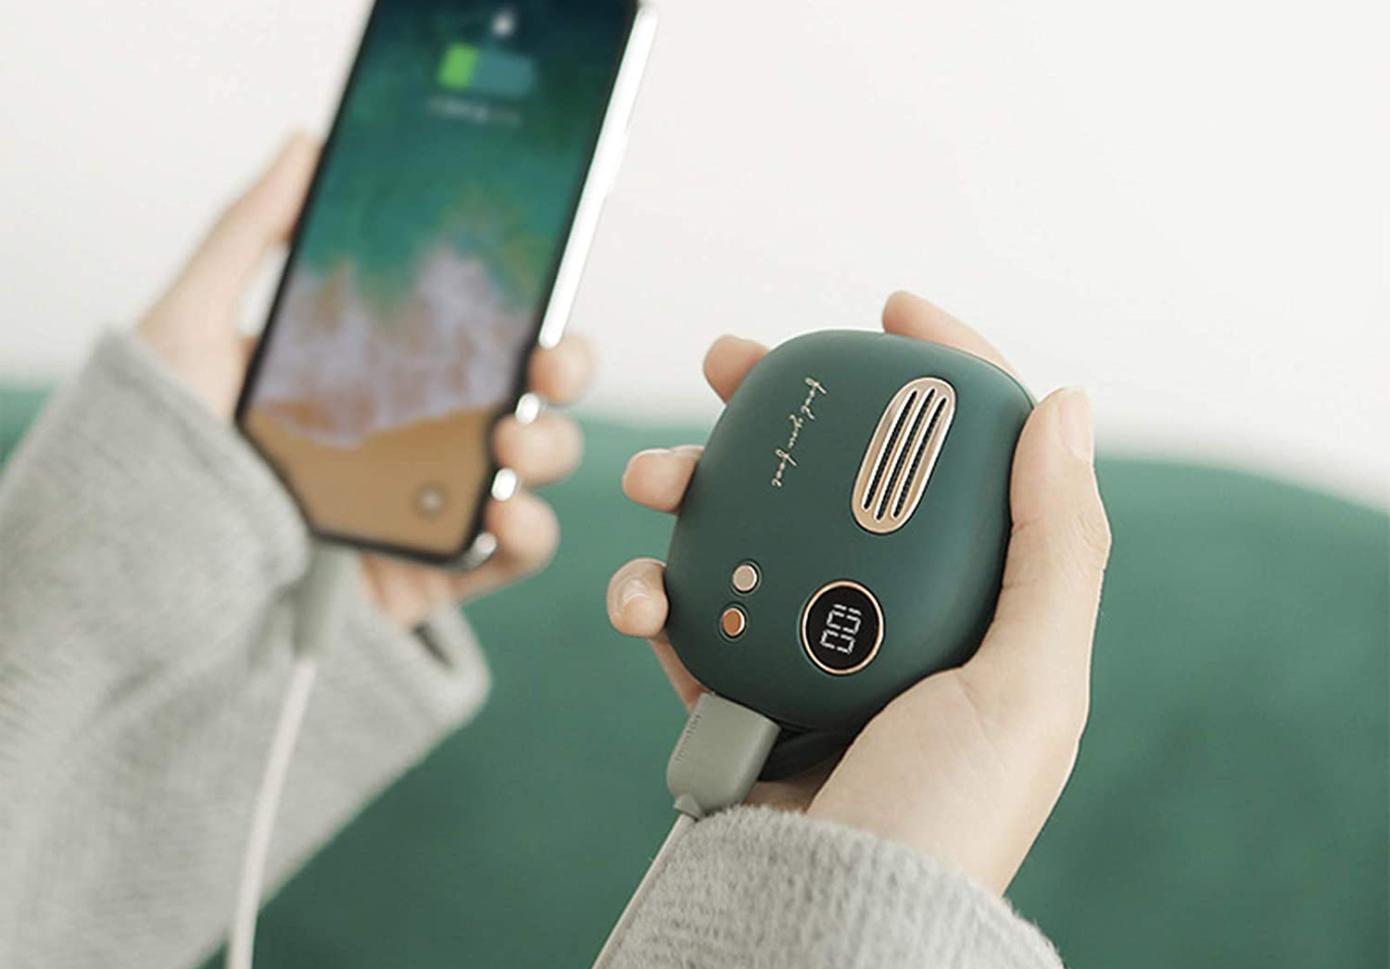 Opisanie Vneshnij Akkumulyator Power Bank Xiaomi Mao Xin Retro Mobile 5000 Mah T 40 3